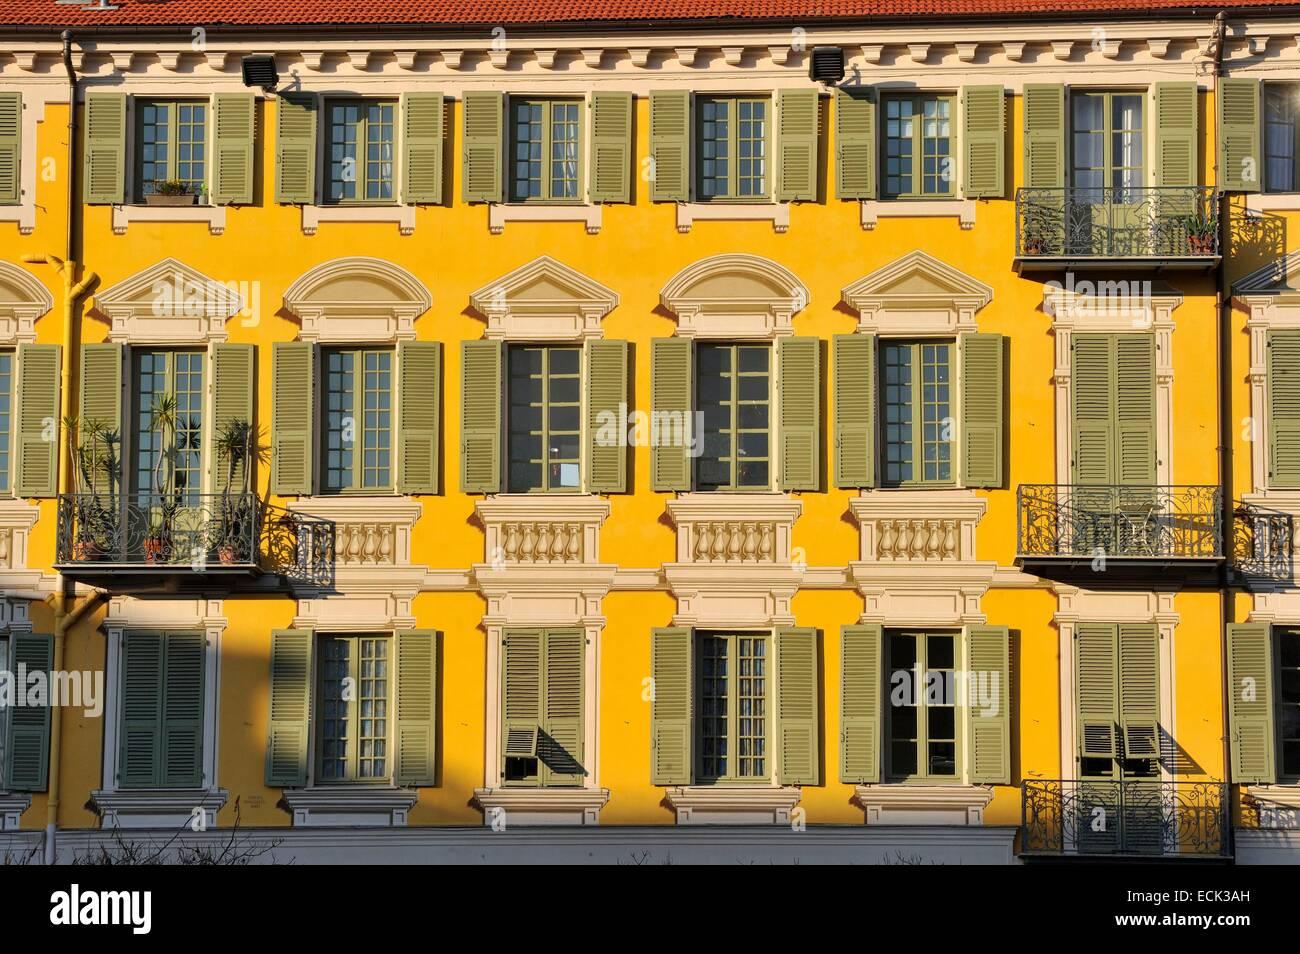 France, Alpes-Maritimes, Nice, place Garibaldi Stock Photo